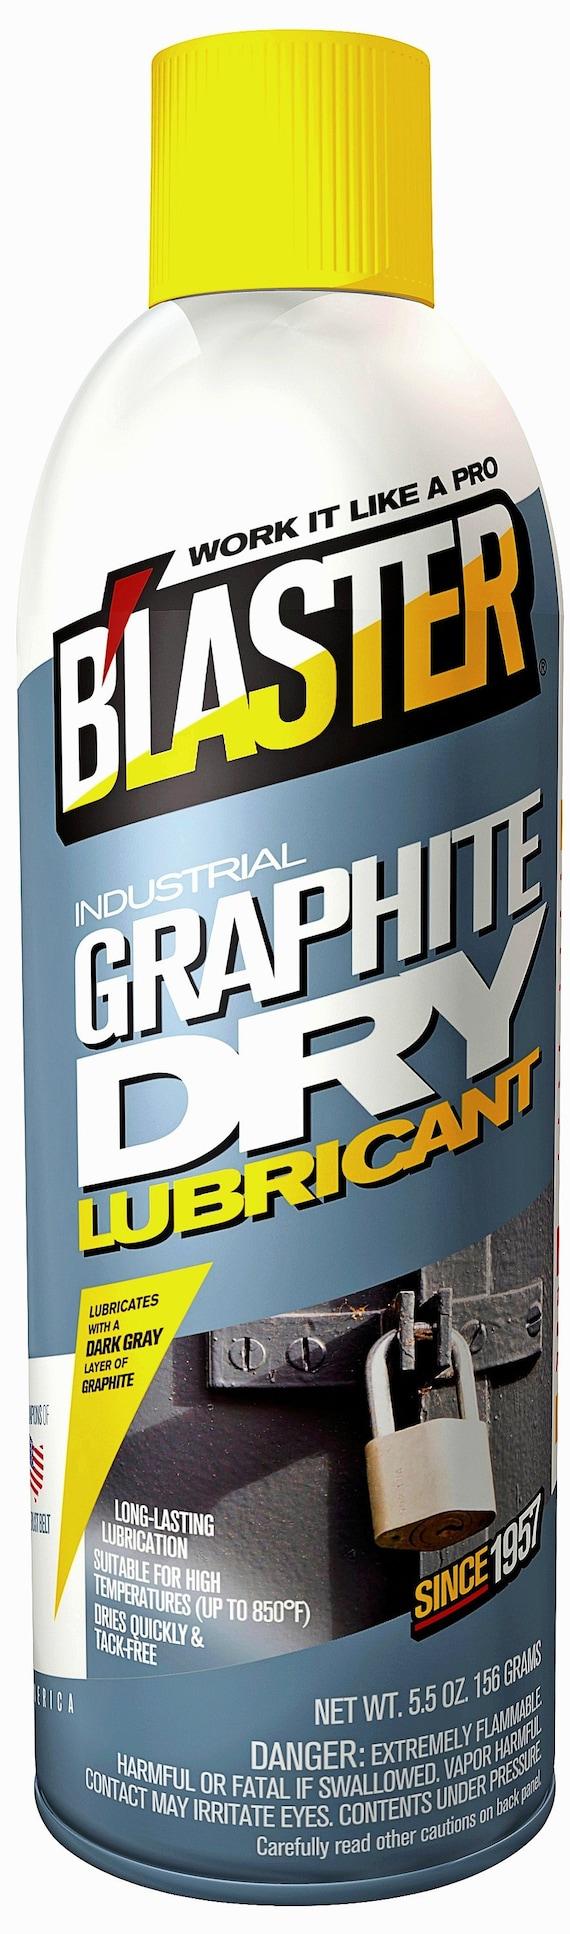 Blaster GRAPHITE Dry aerosol spraY Lubricant Lubrication for rubber metal  wood plastic locks chains roller threads anti seize B'LASTER 8-GS